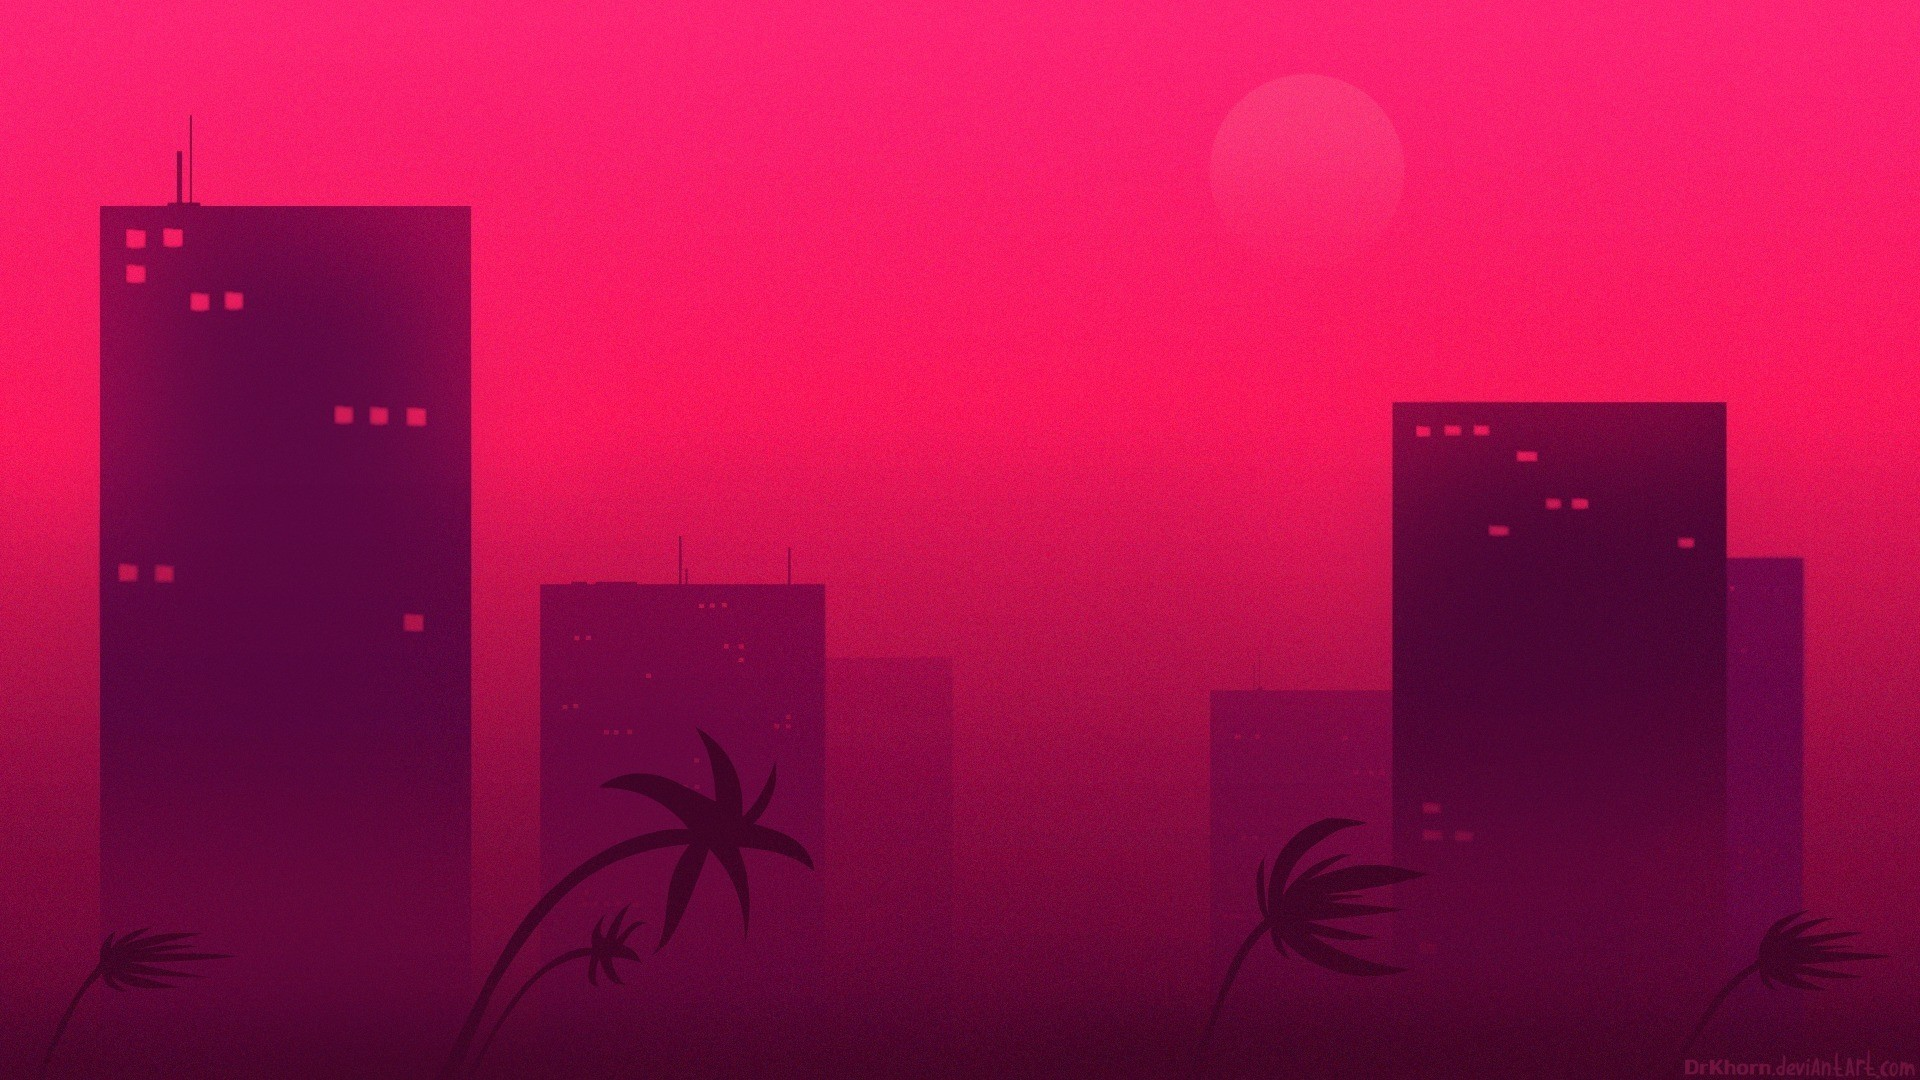 Hotline Miami Desktop Wallpaper